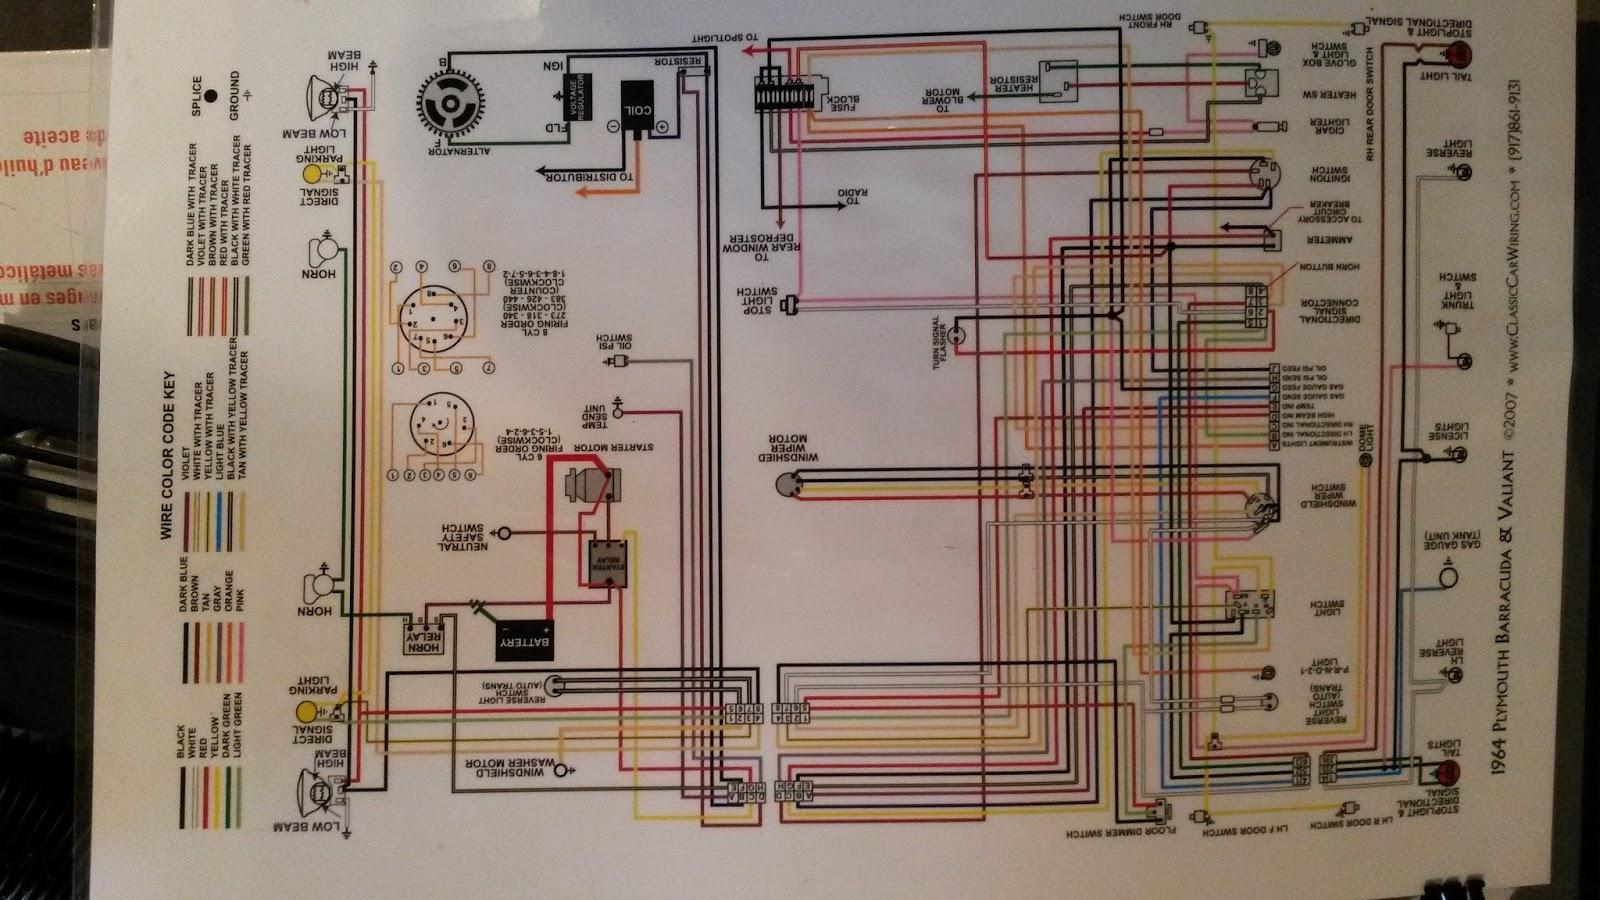 small resolution of 1967 barracuda wiring diagram wiring diagram gpwrg 7489 wiring diagram 1967 belvedere 1967 barracuda wiring